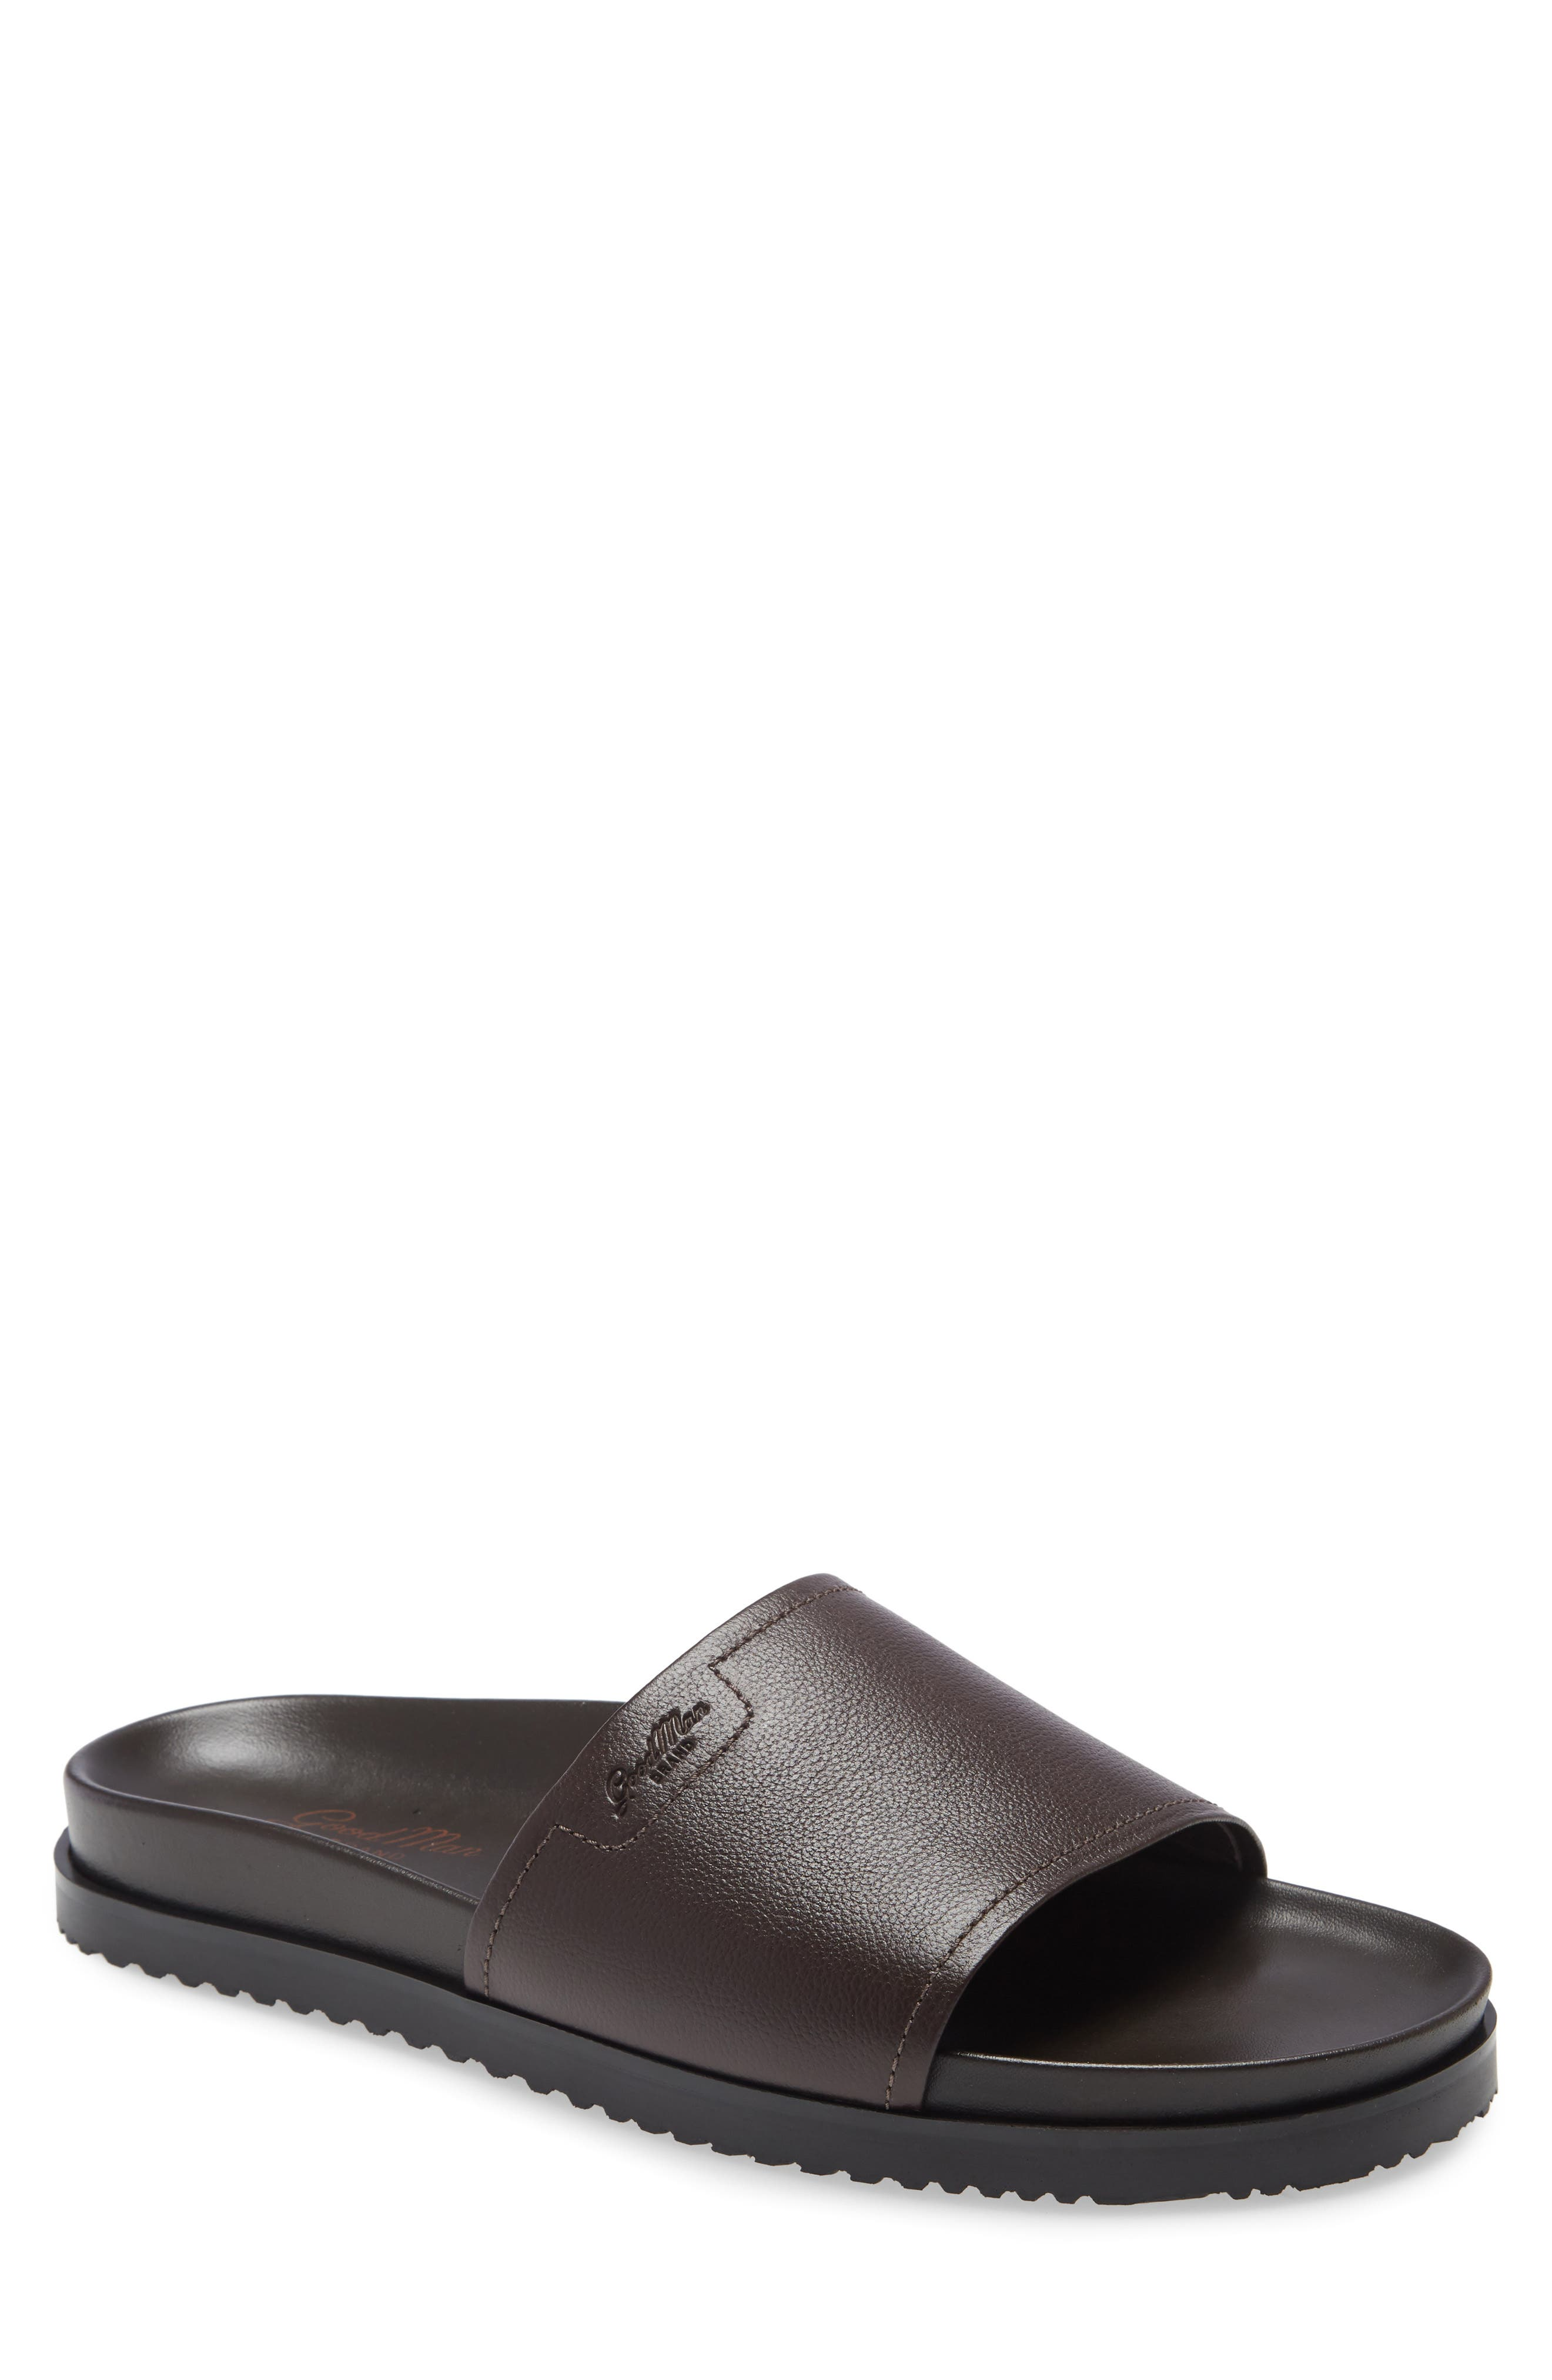 Sardina Slide Sandal